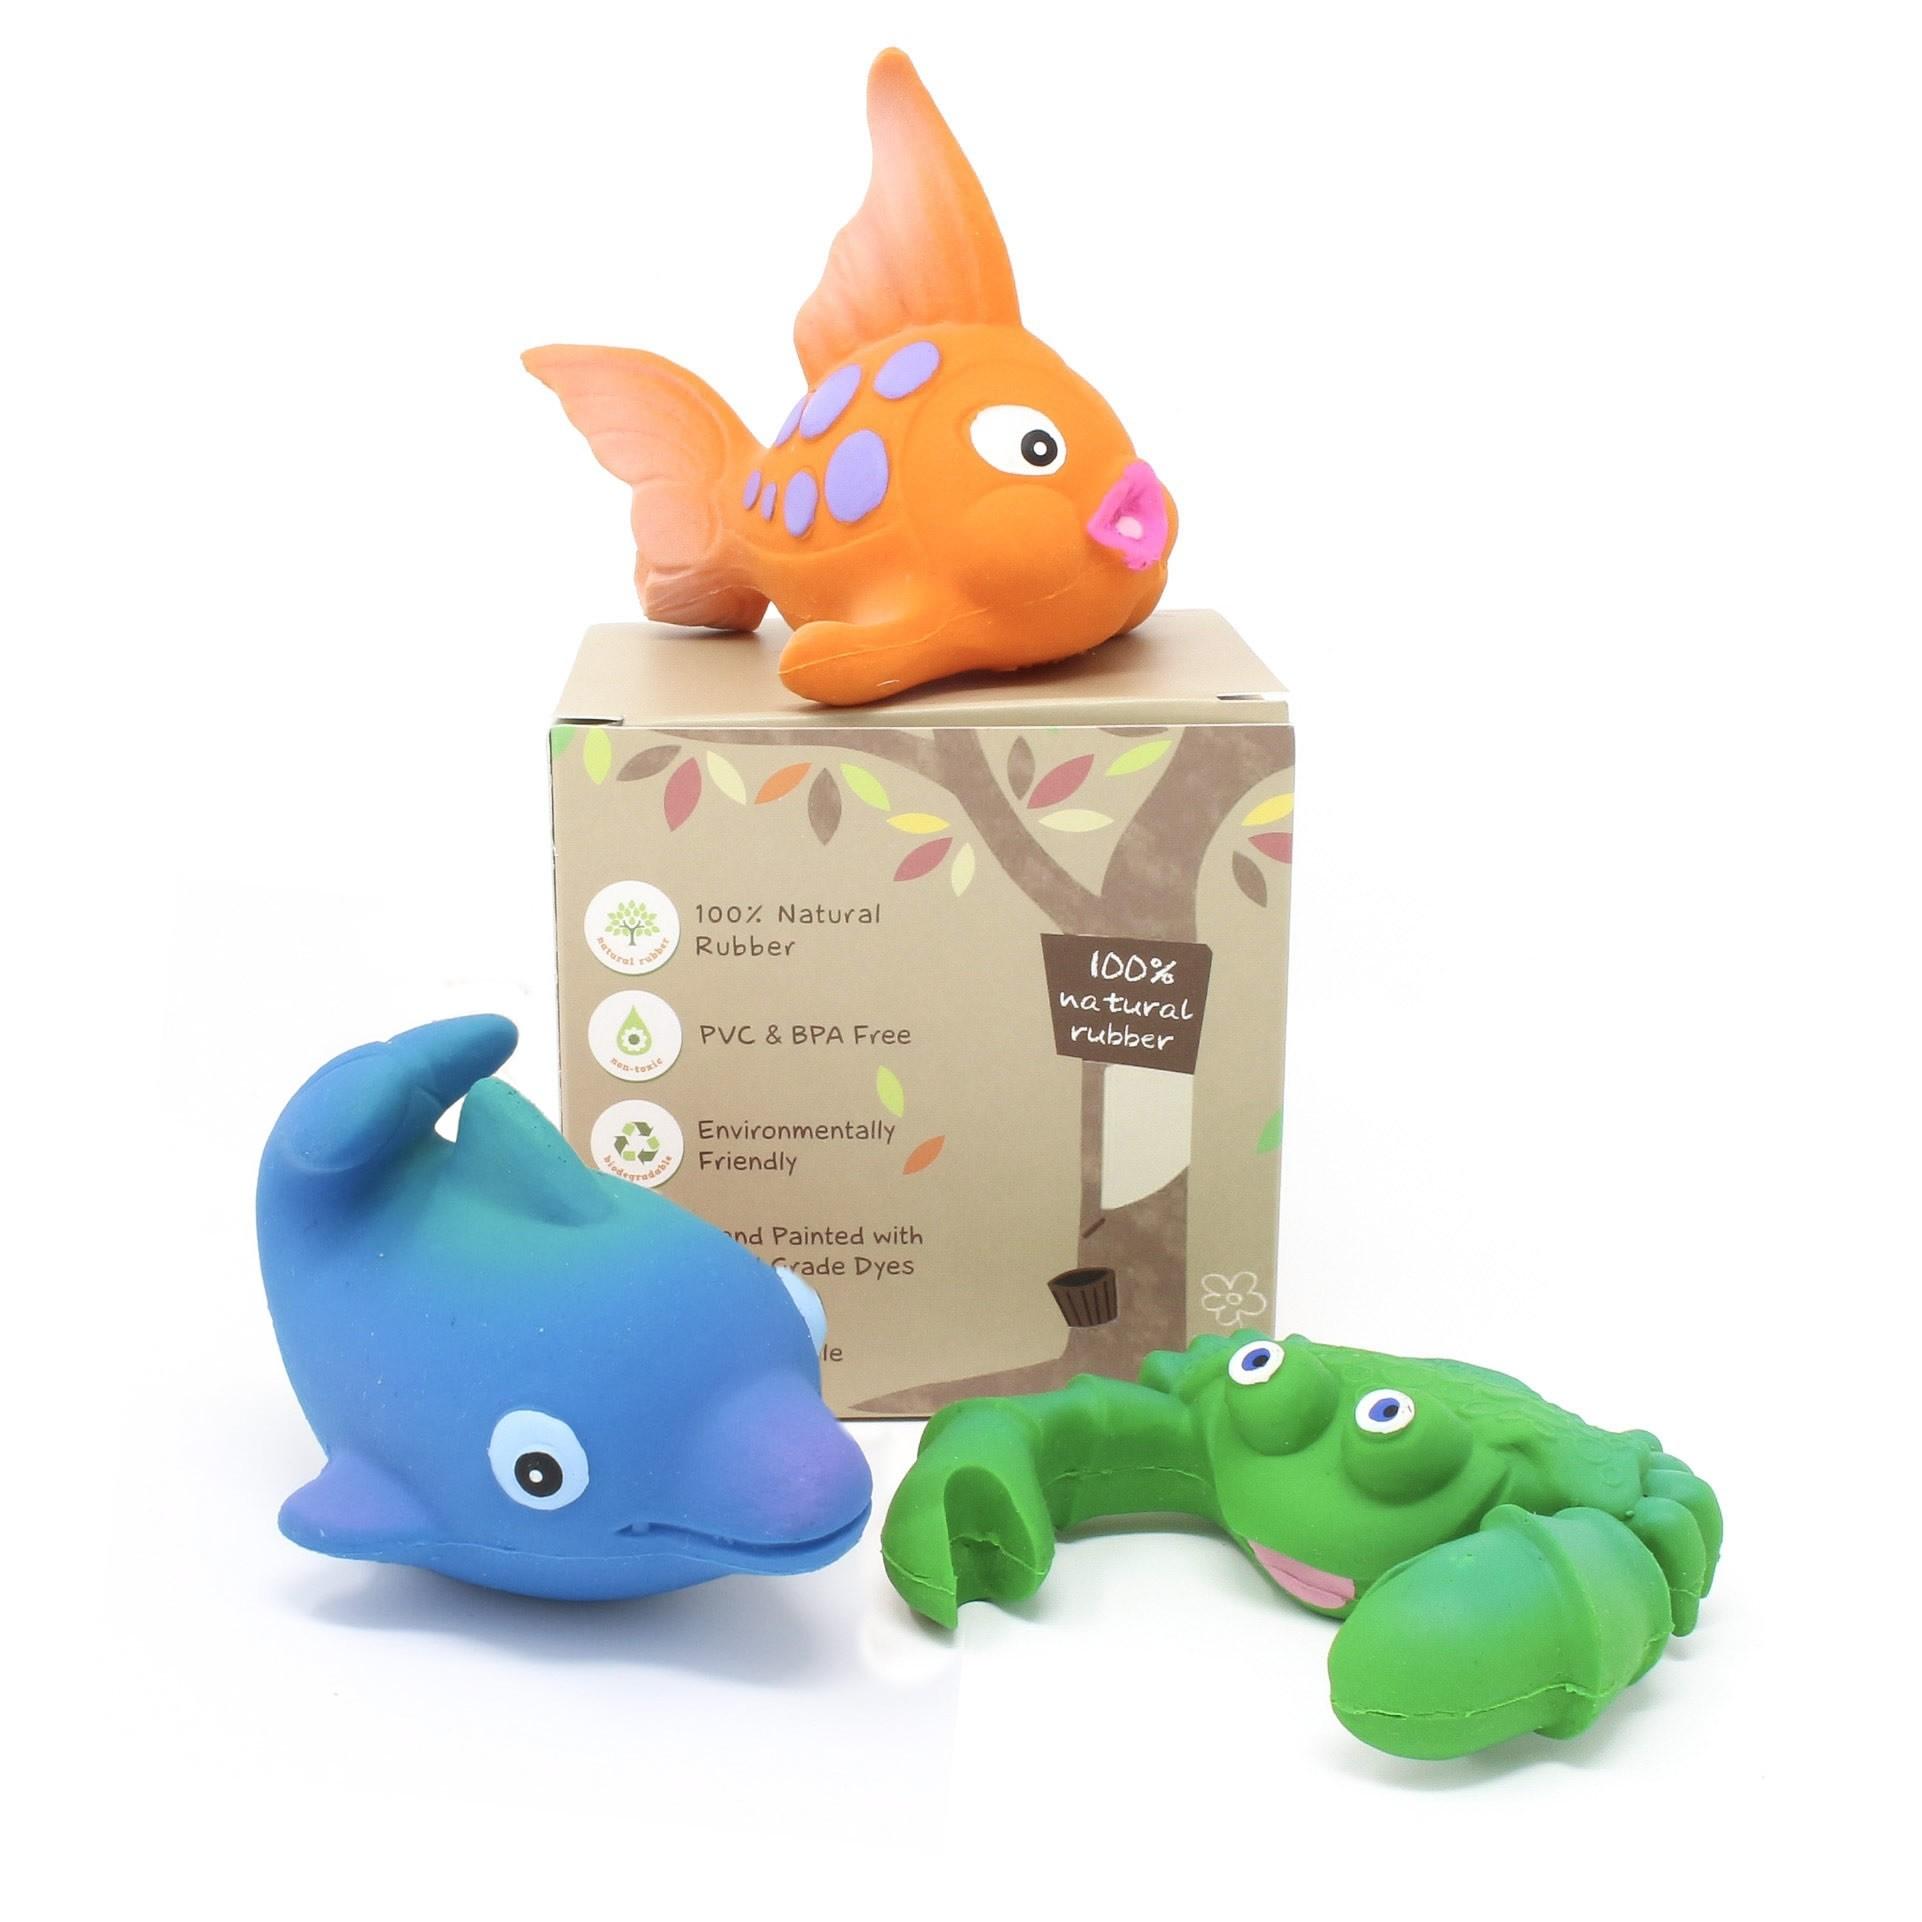 100% Natural Rubber Bath Toys, Ocean Play Set